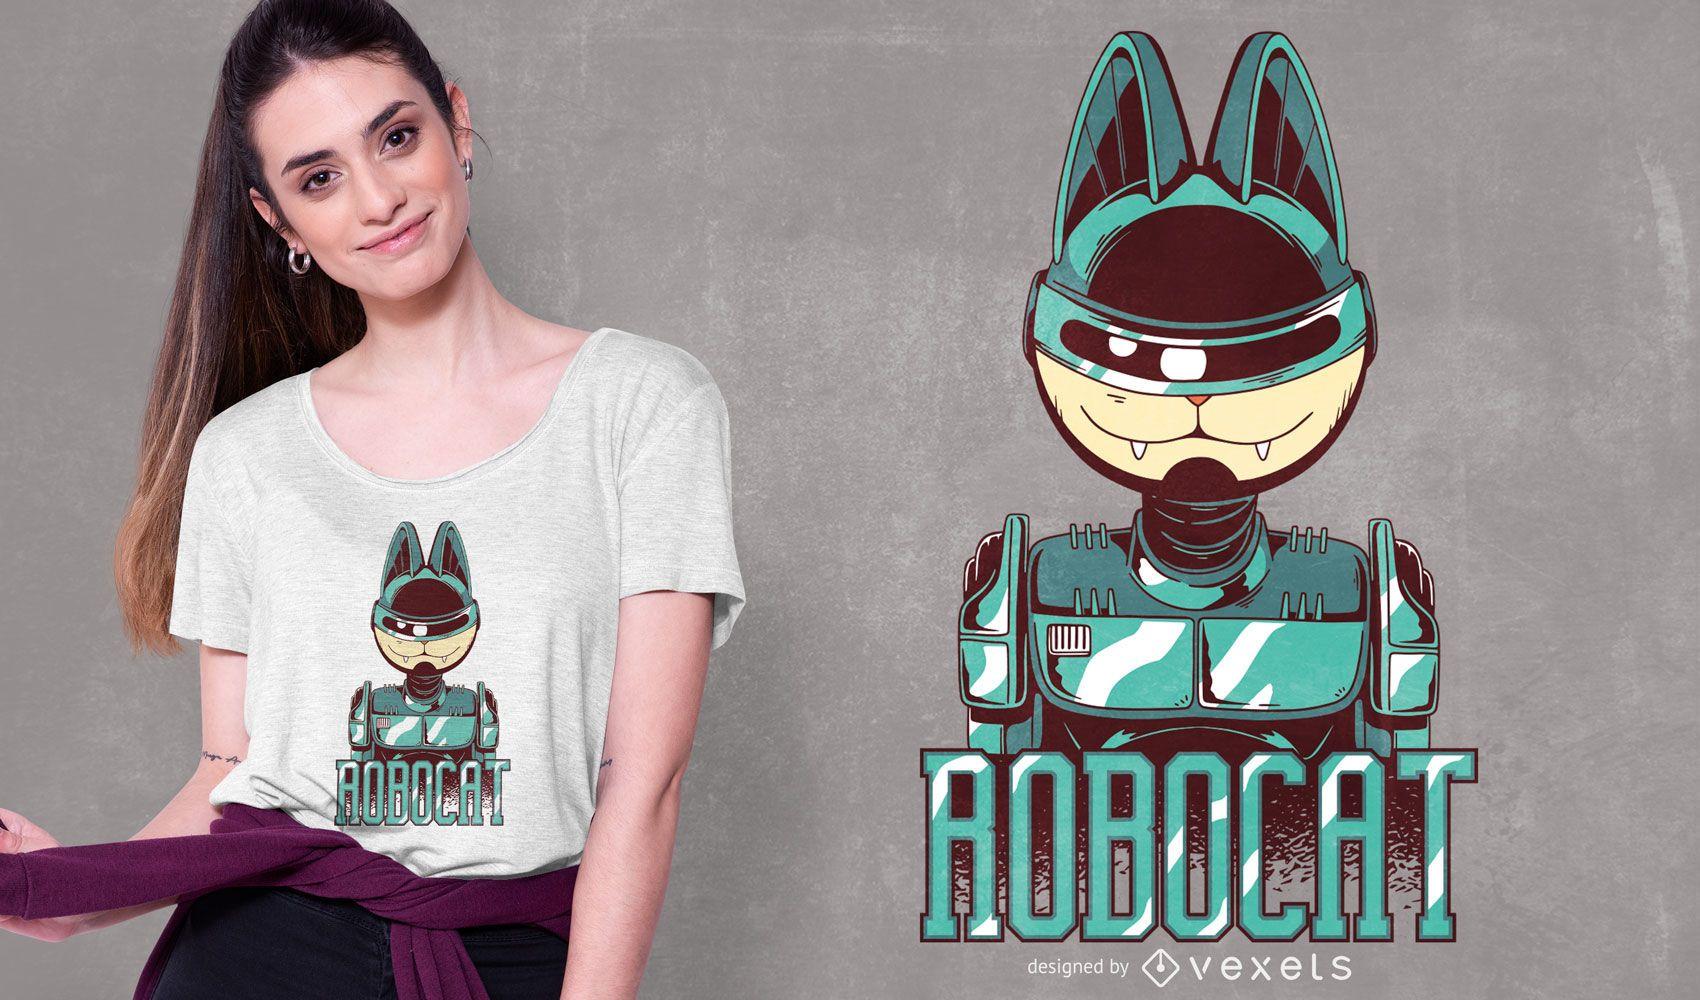 Robocat t-shirt design